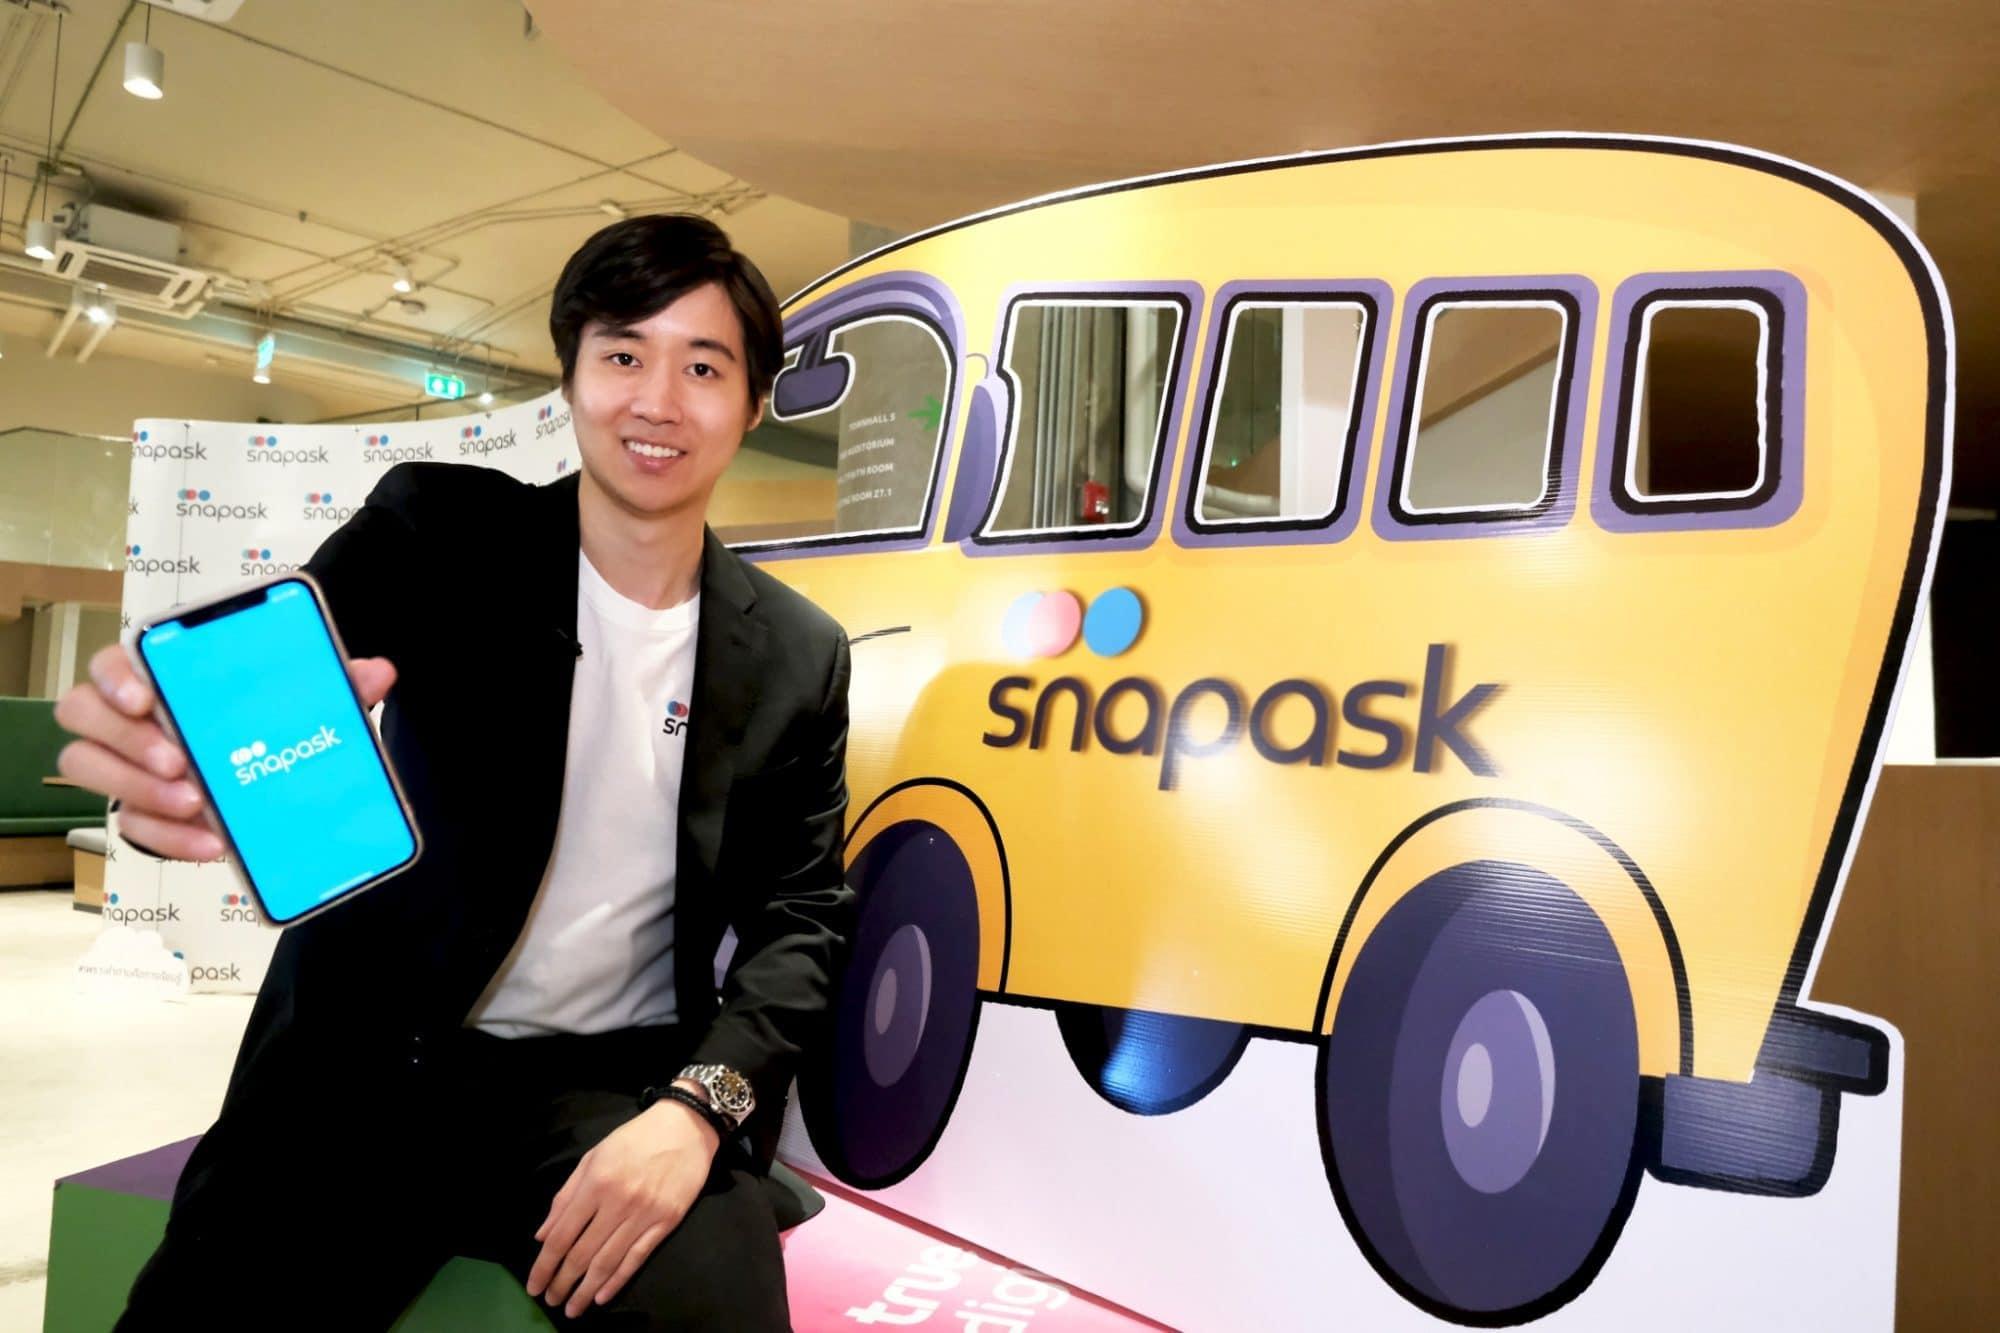 Snapask New Gen Dream เผย 3 ฟีเจอร์ใหม่ เพื่อเด็กรักเรียน 2